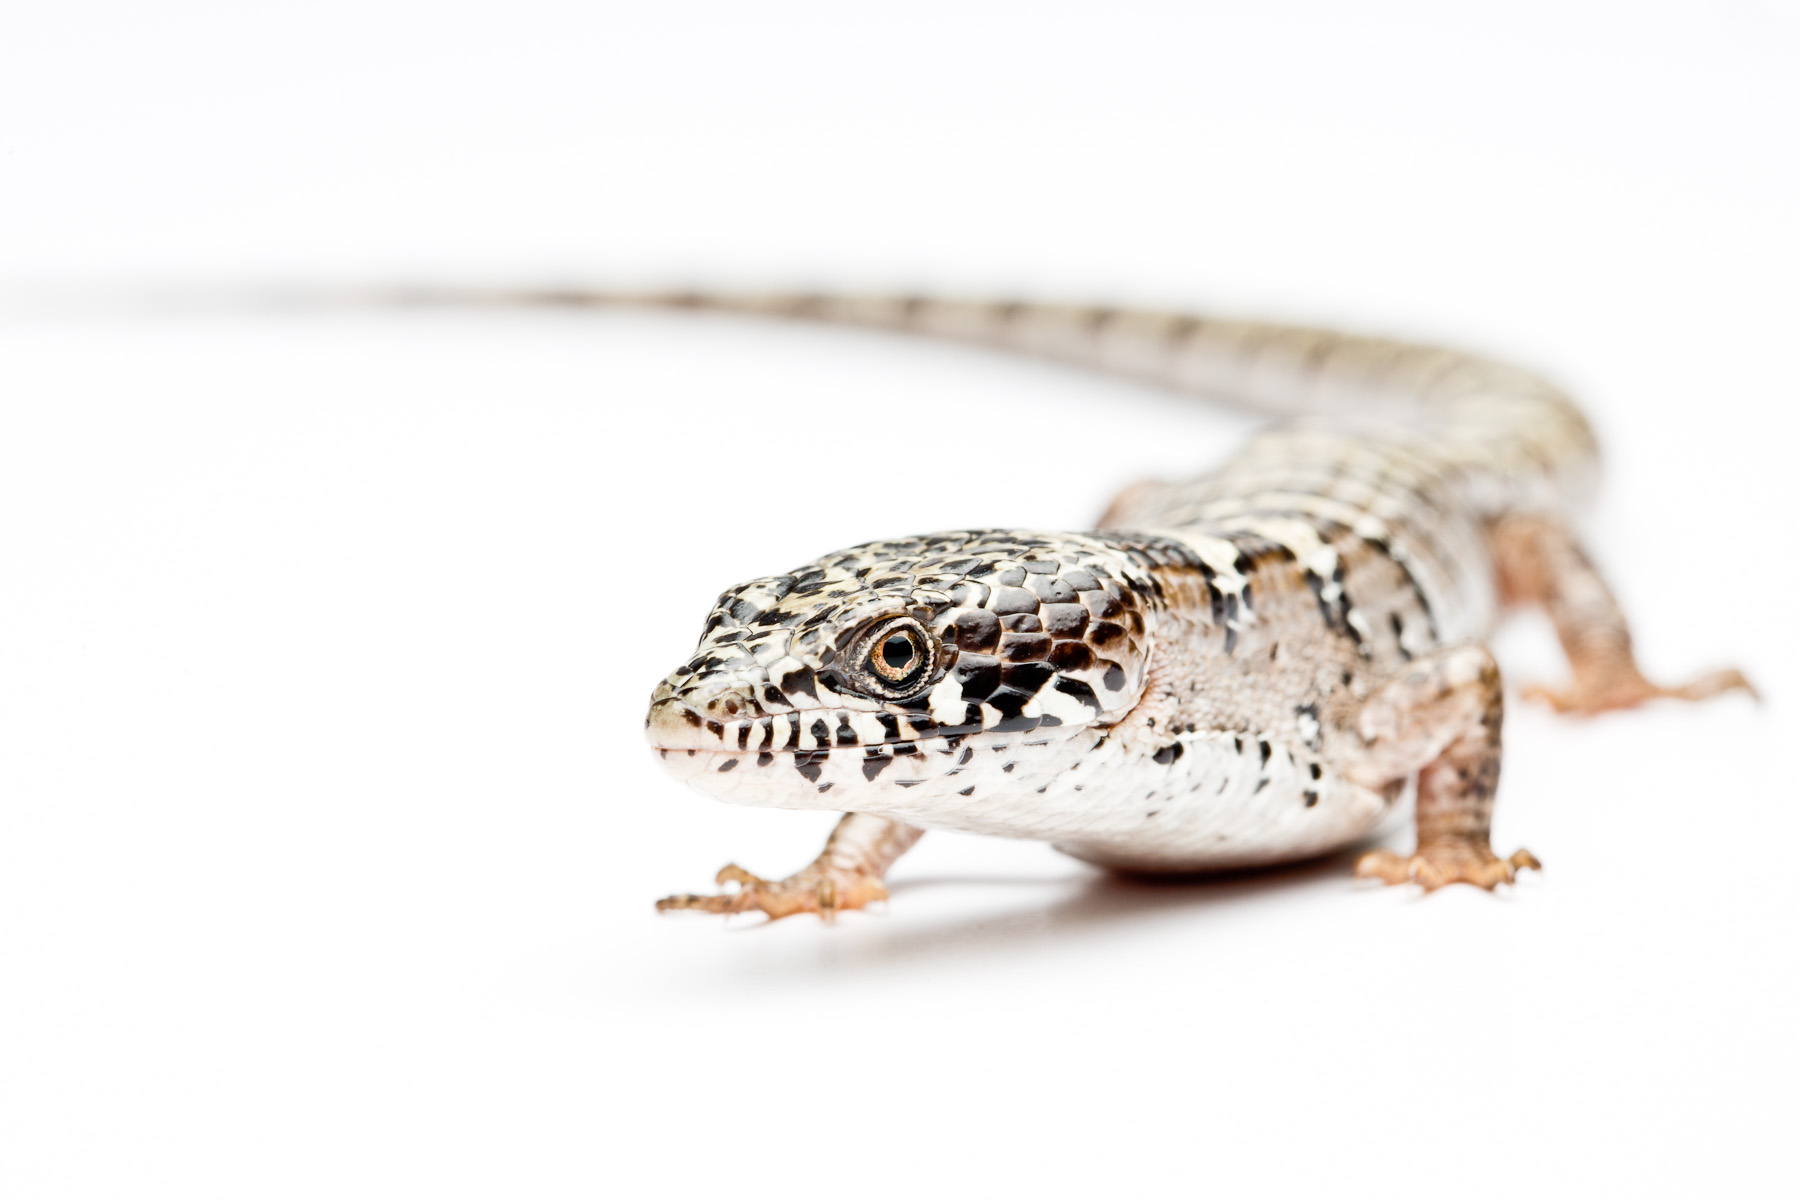 Adult male Madrean alligator lizard (White Mountains locale)